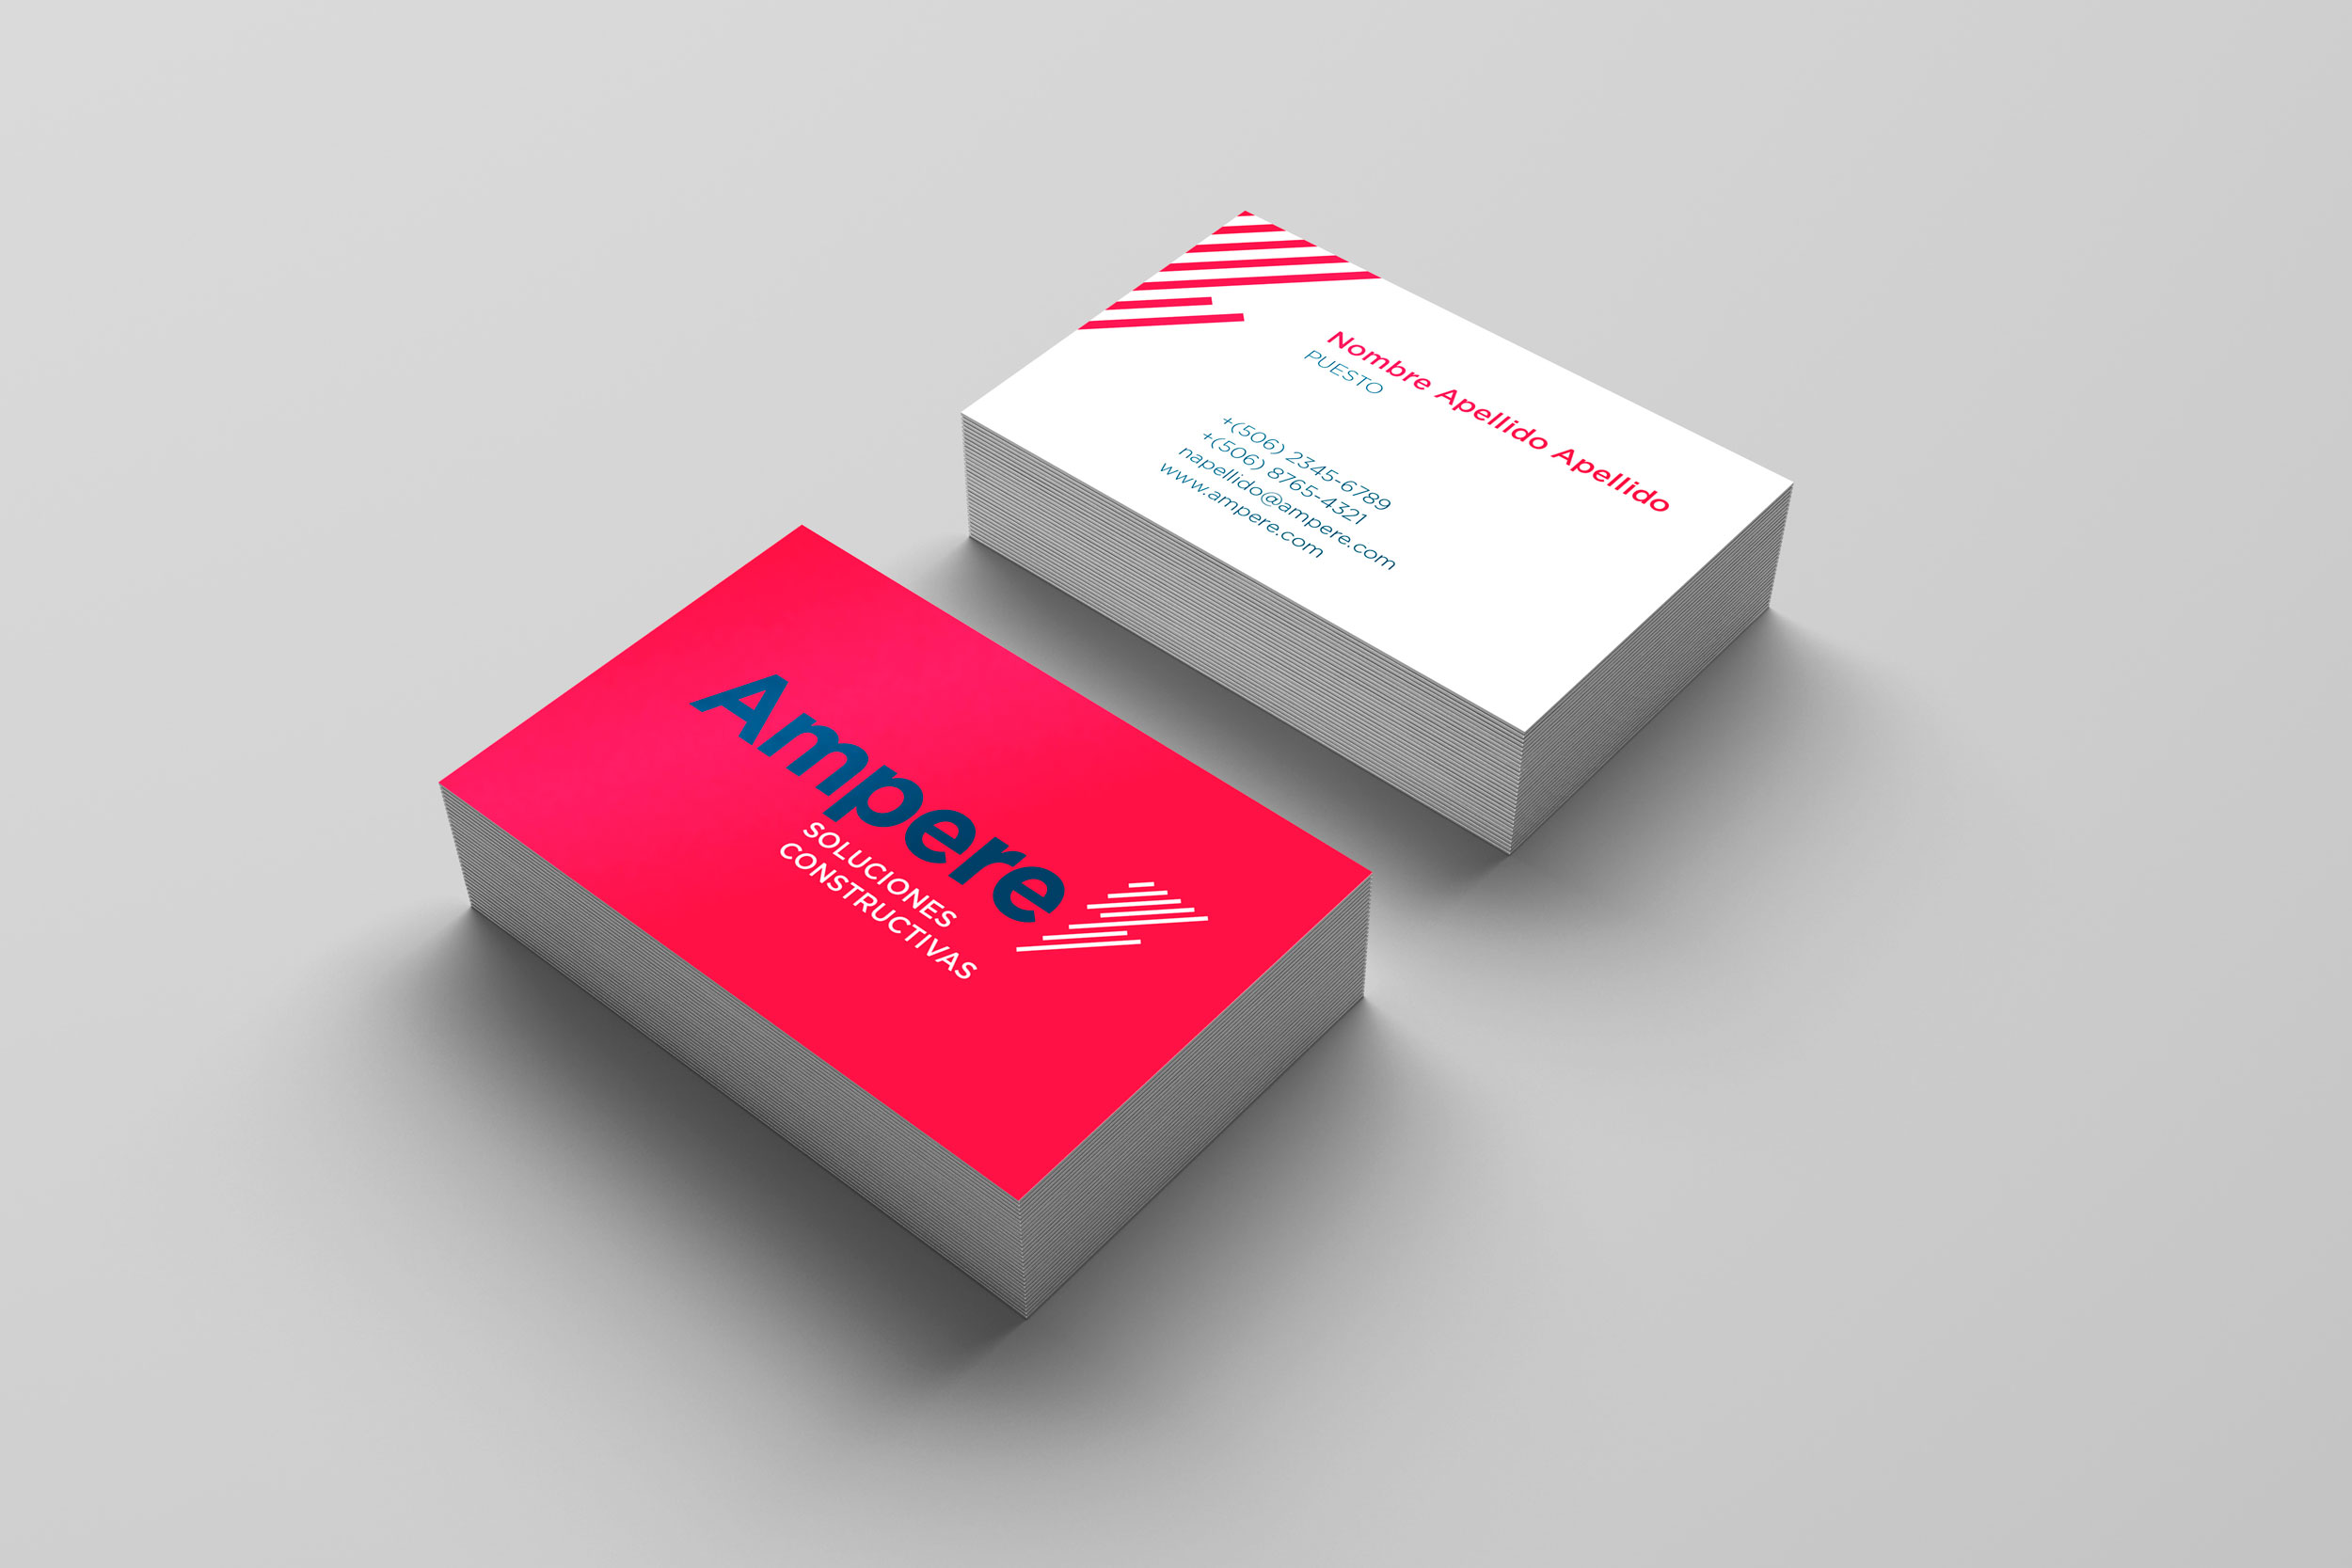 ampere-tarjetas-1.jpg